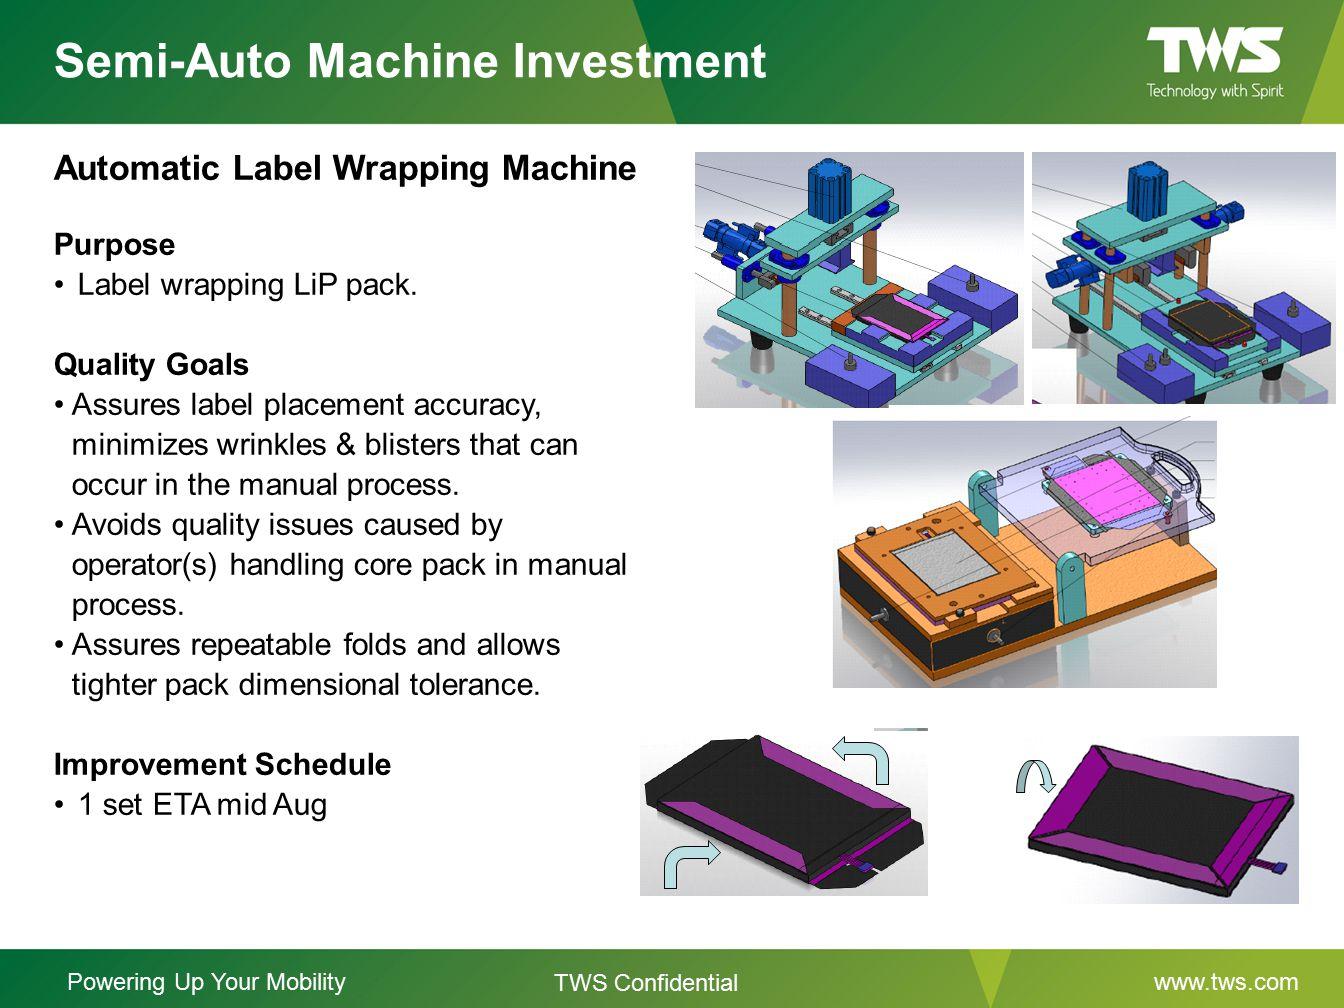 Powering Up Your Mobilitywww.tws.com TWS Confidential Semi-Auto Machine Investment Automatic Label Wrapping Machine Purpose Label wrapping LiP pack. Q